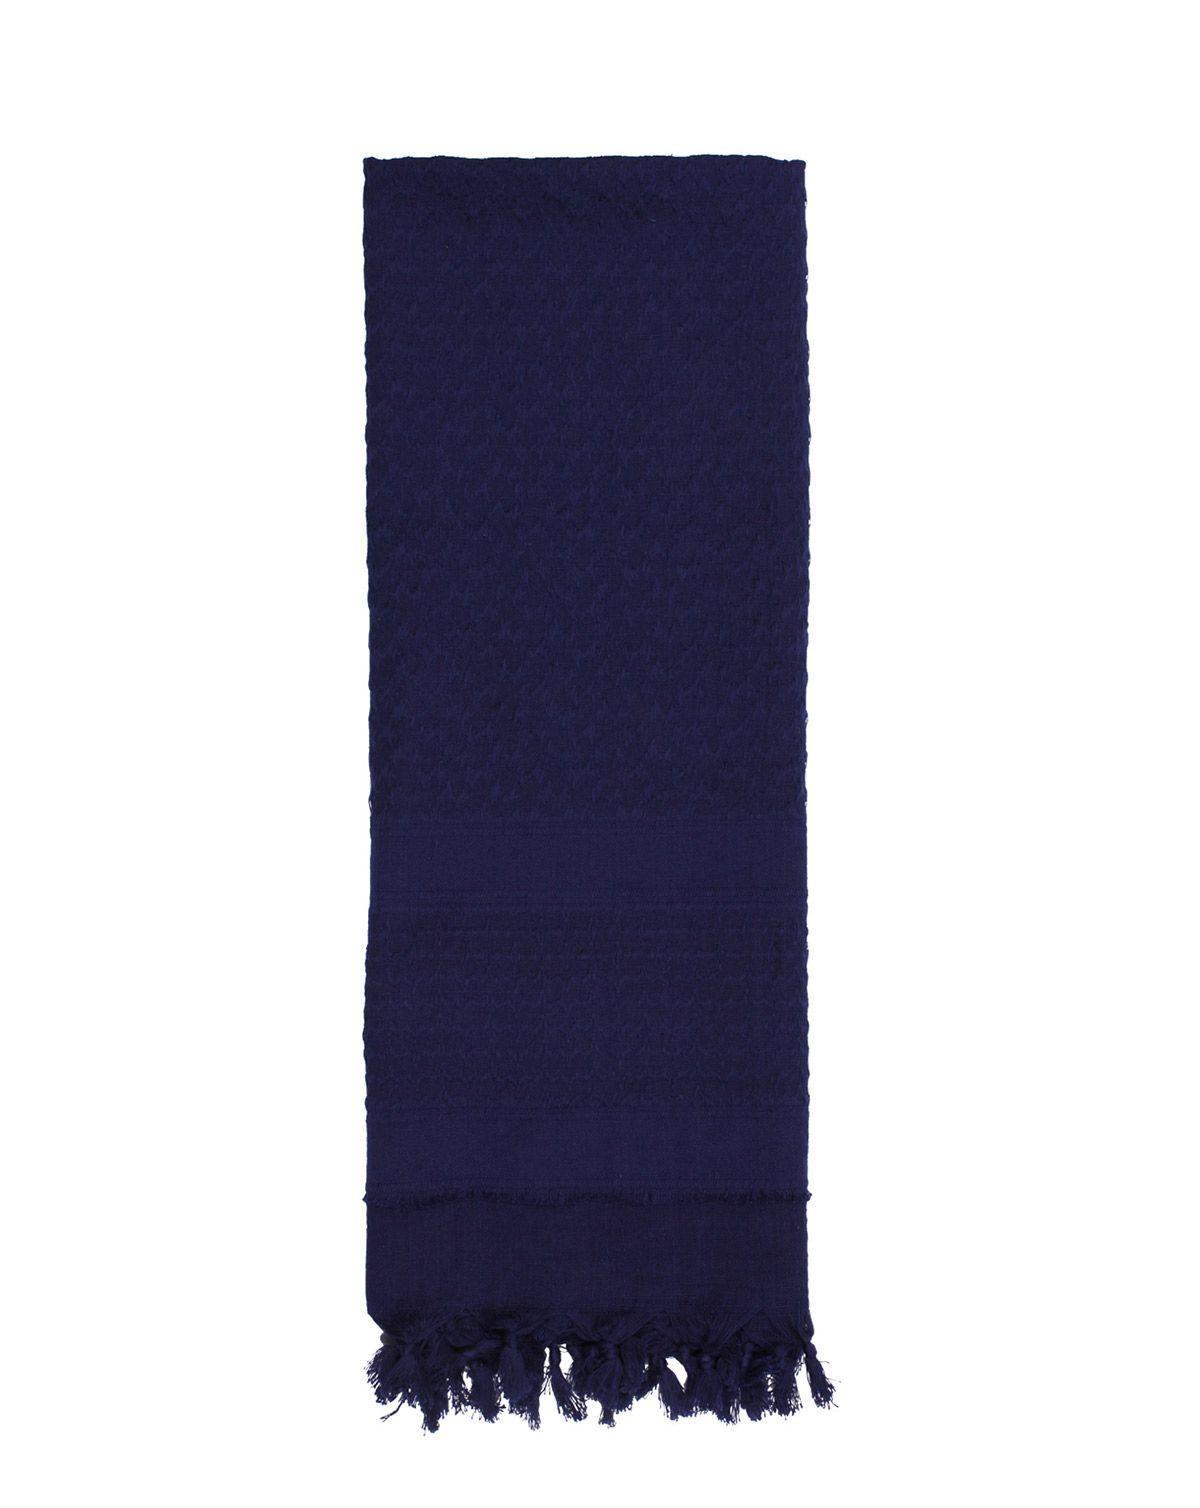 Rothco Deluxe Partisan Halsduk Enfärgad (Navy, One Size)